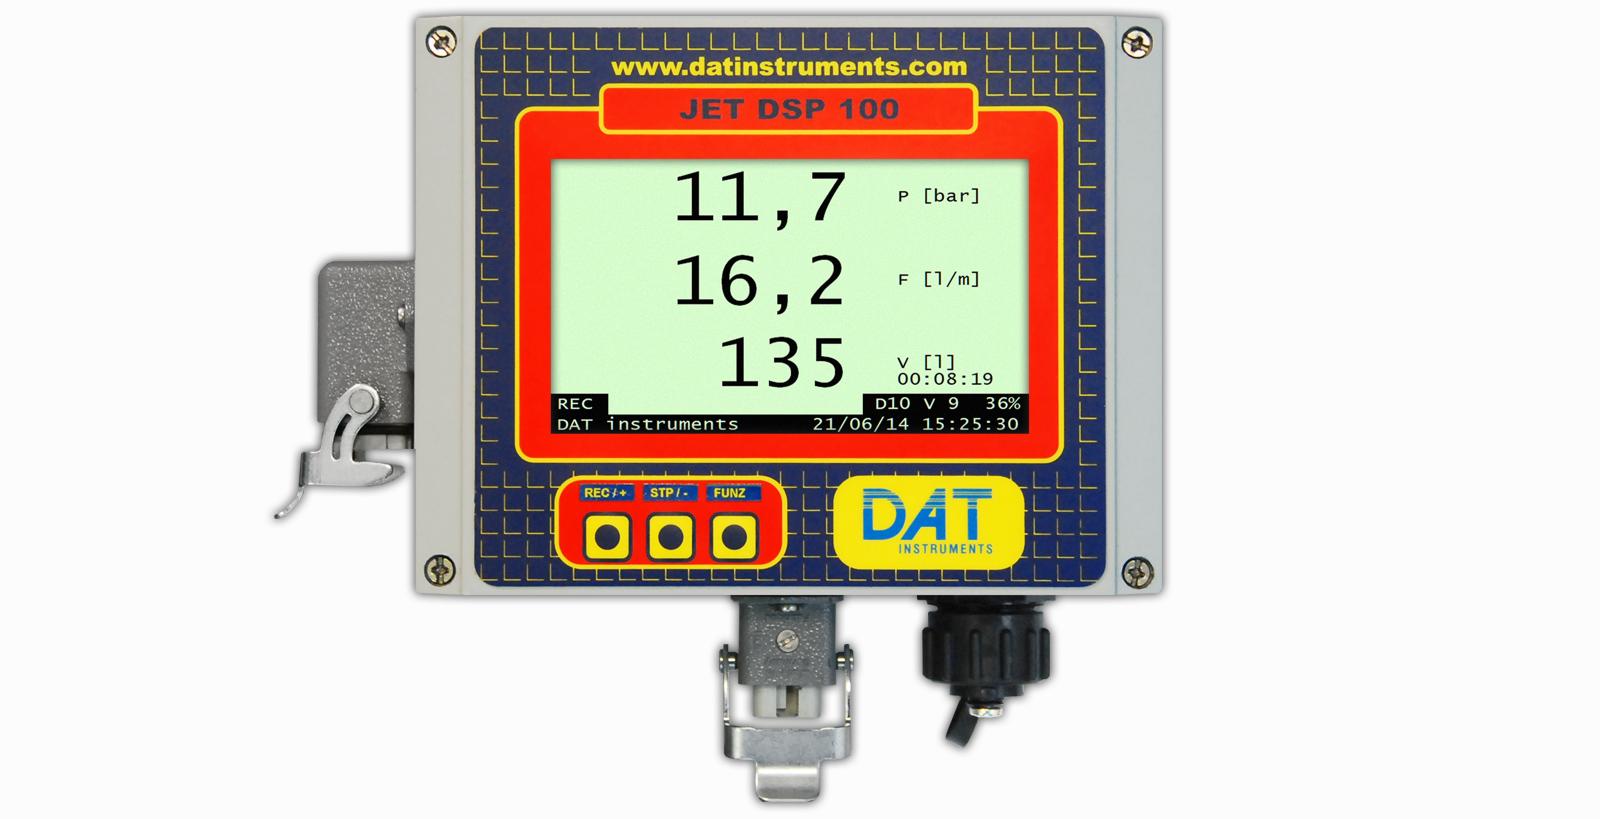 DAT instruments, JET DSP 100 - I - IR - IRT, datalogger para Inyecciones de cemento, Pruebas Lugeon